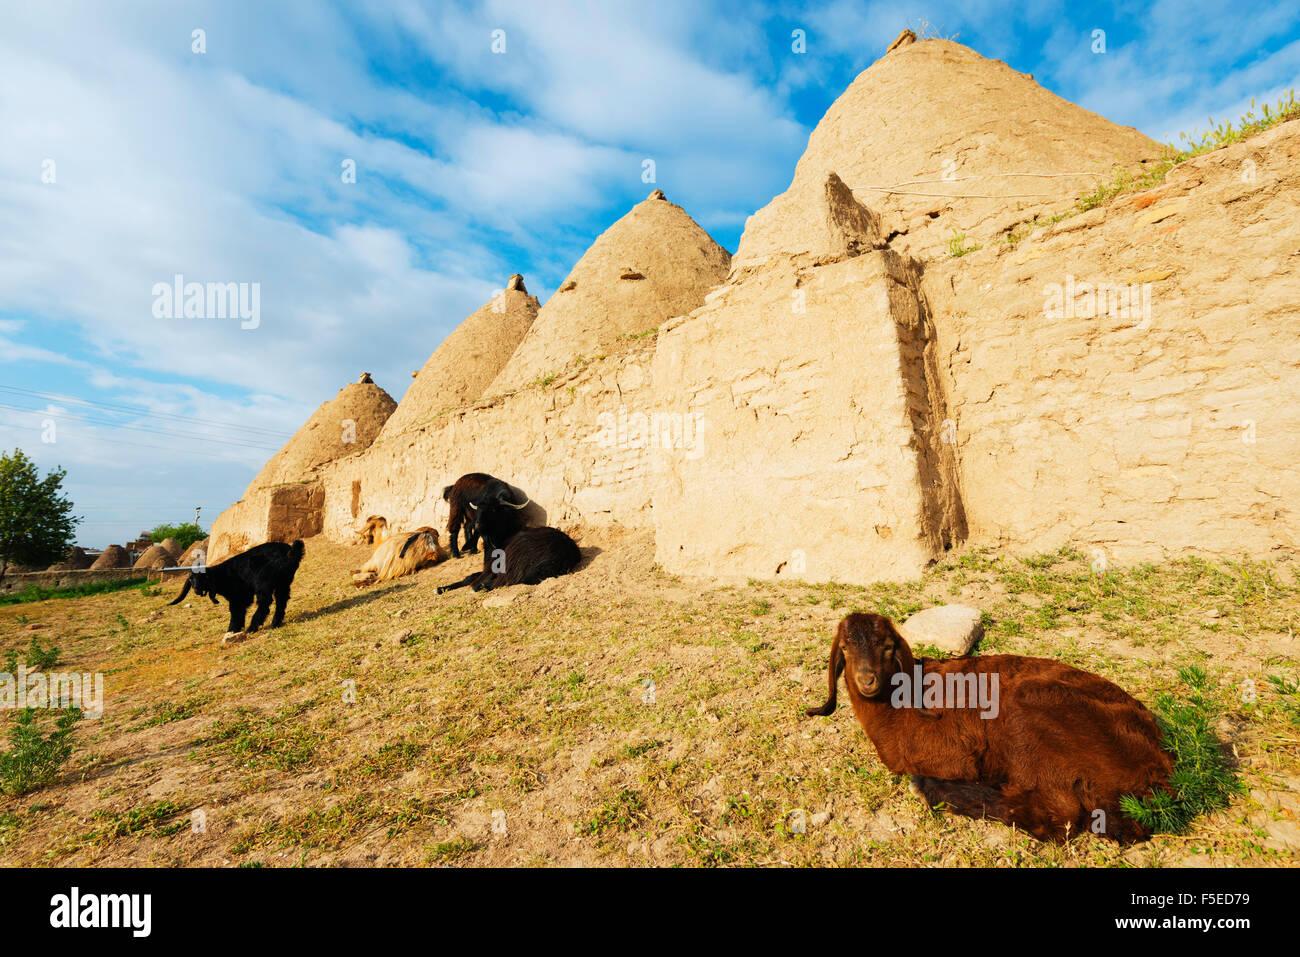 Bee-hive mud brick houses and goats, village of Harran, Anatolia, Turkey, Asia Minor, Eurasia - Stock Image